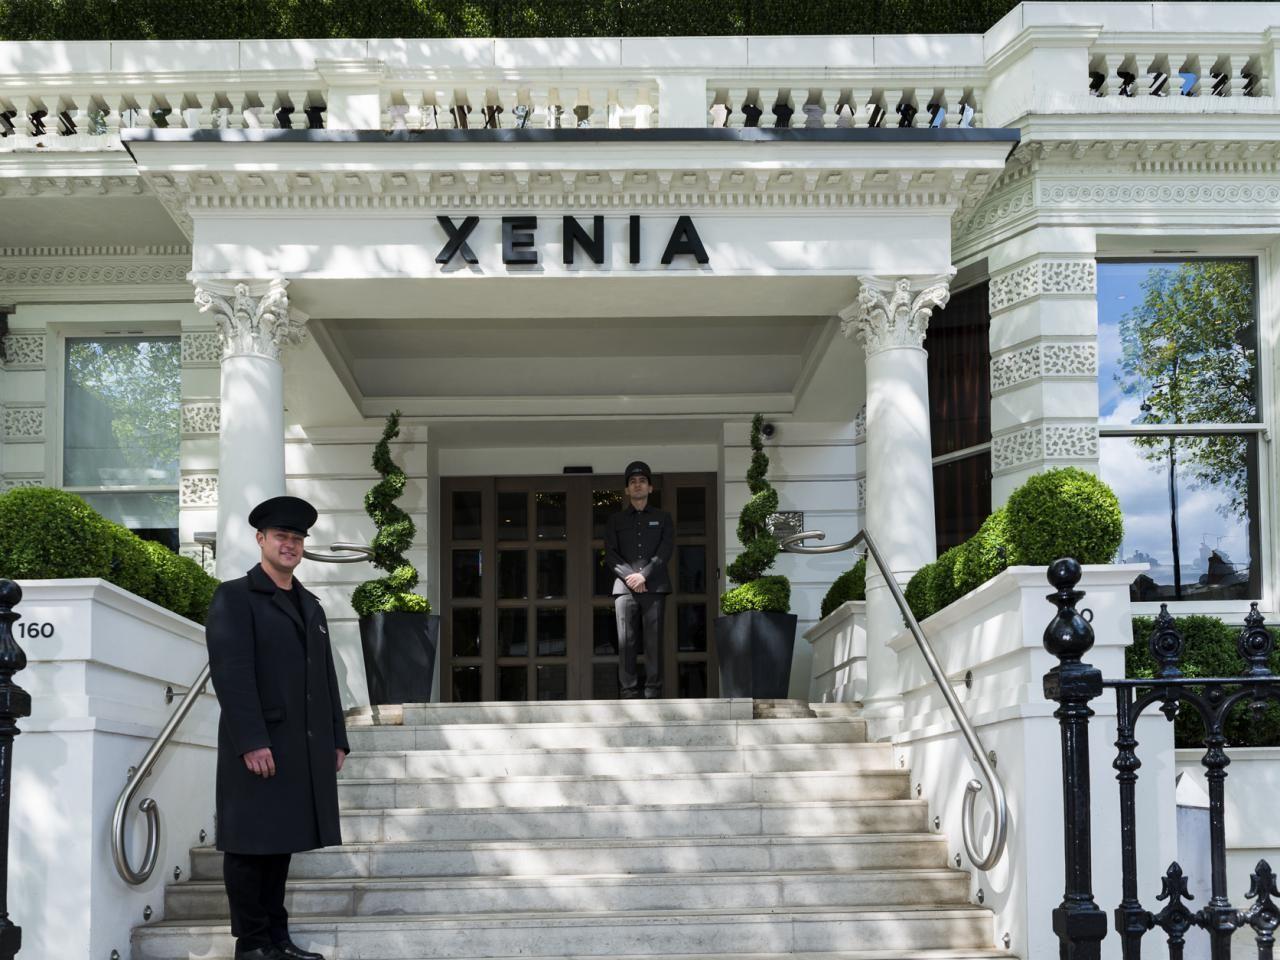 Hotel Xenia London Cerca Con Google Xenia Hotel London Bucket List London